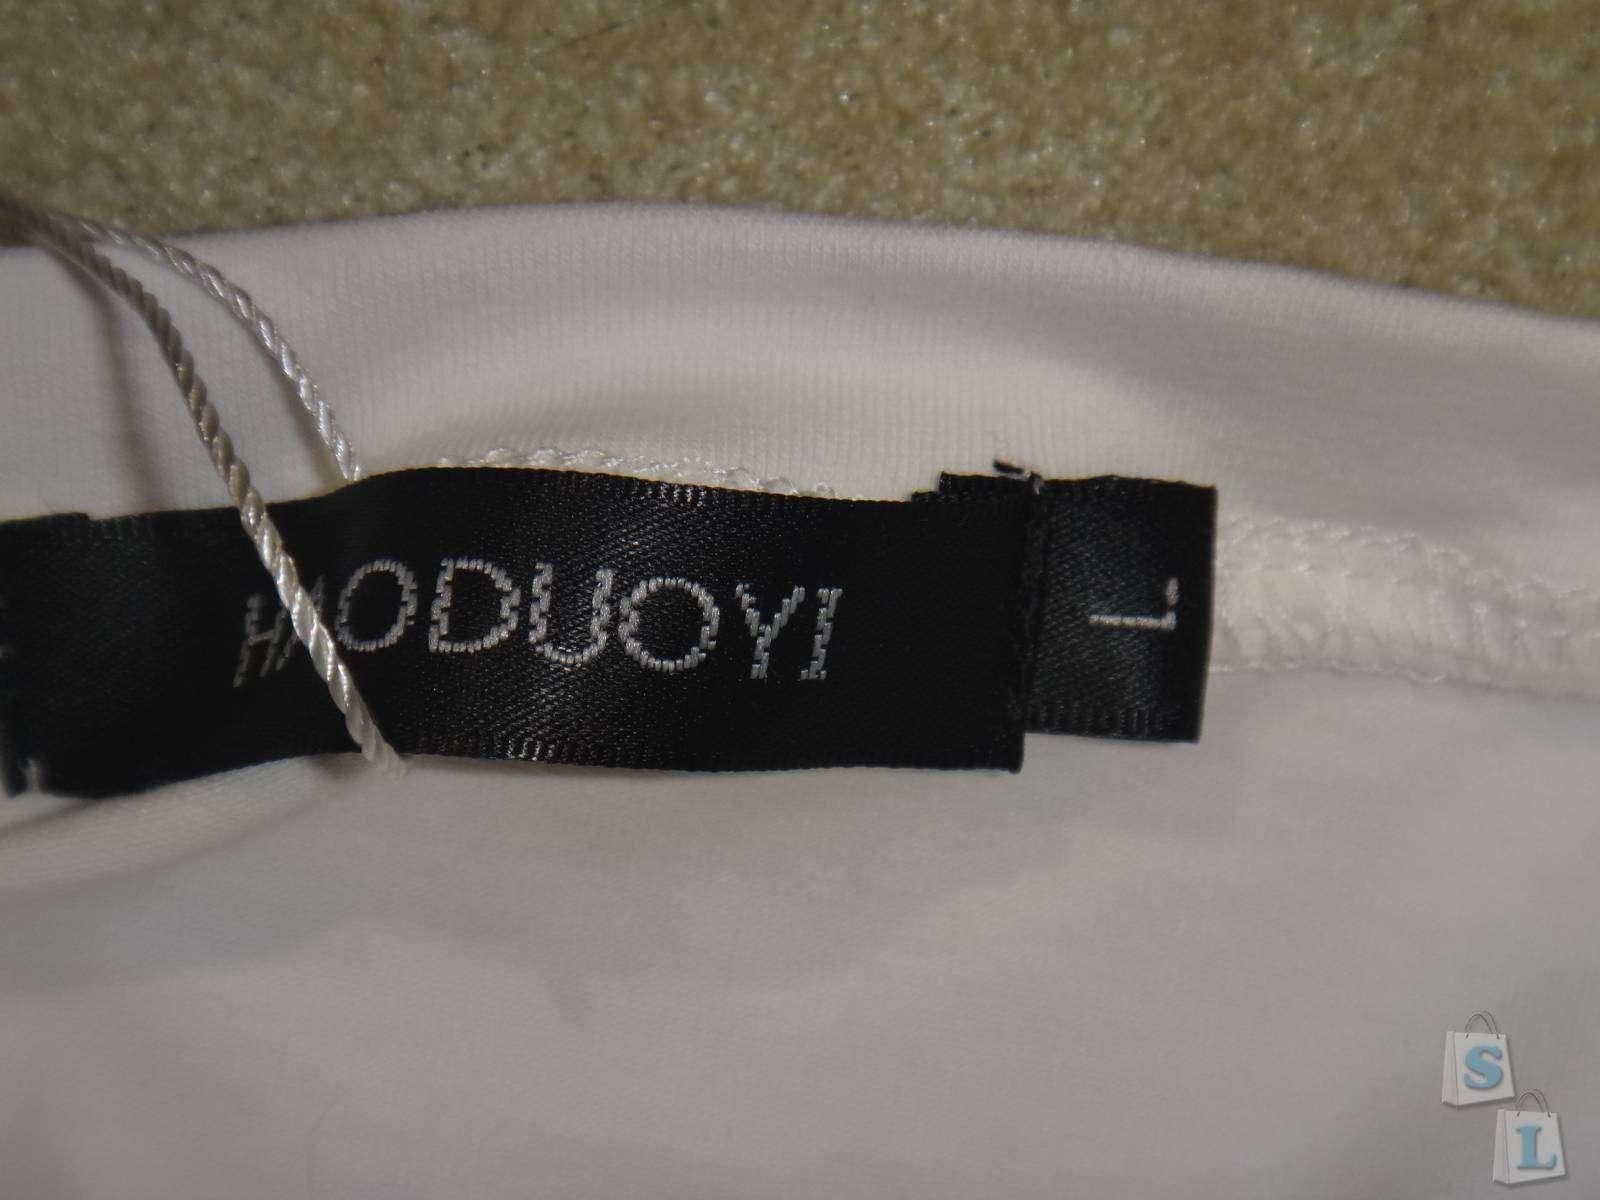 CooliCool: Обзор толстовки с изображением единорога